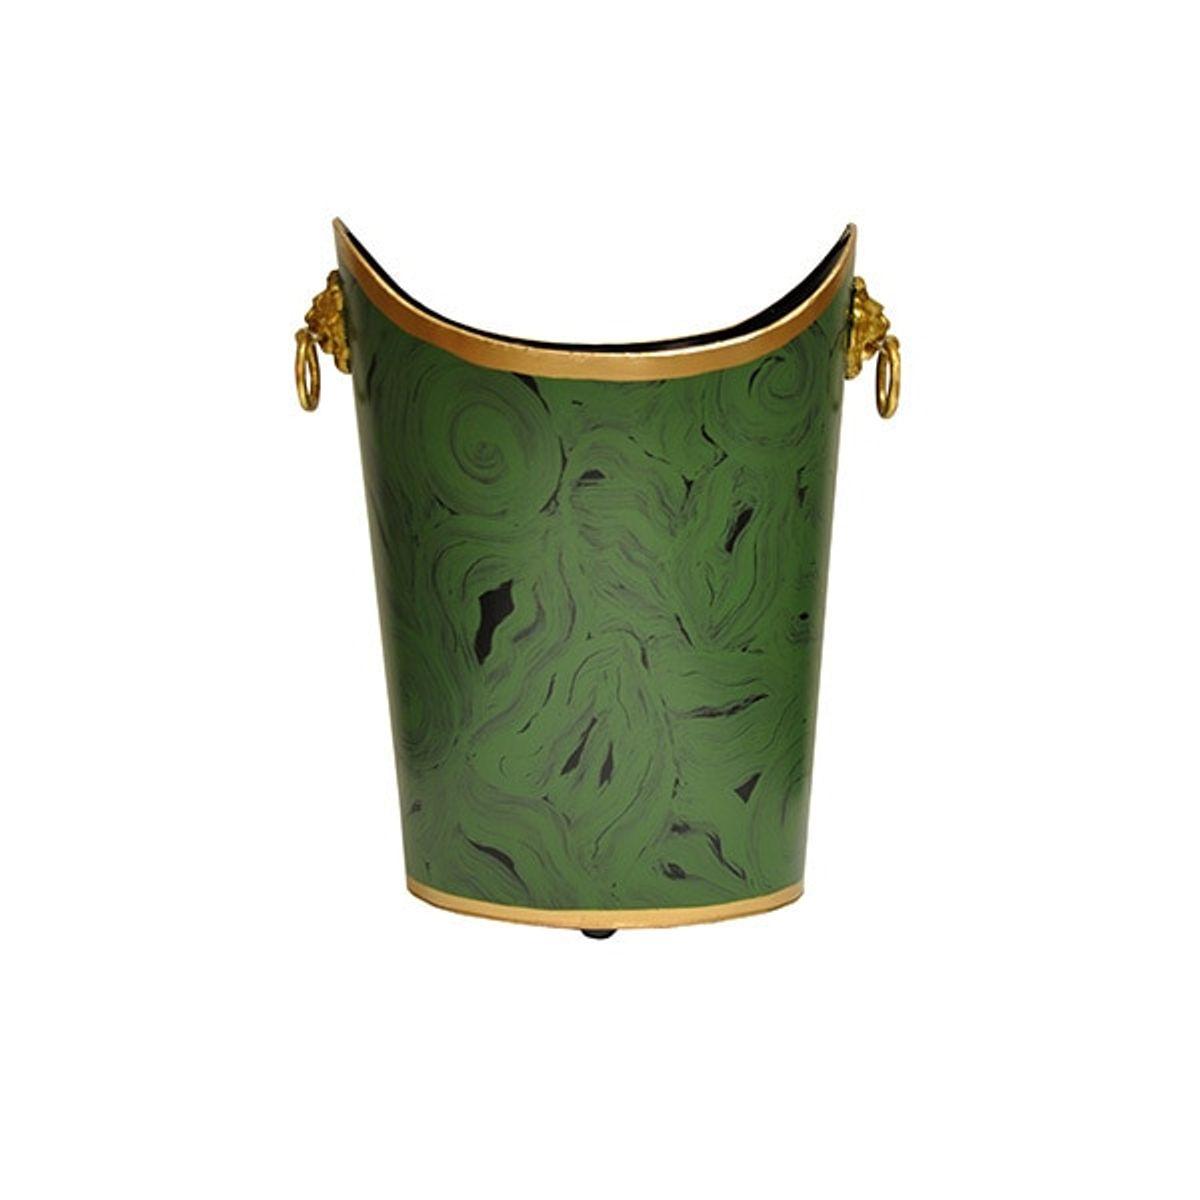 Wblionov Mal, Oval Wastebasket With Lion Handles In Malachite